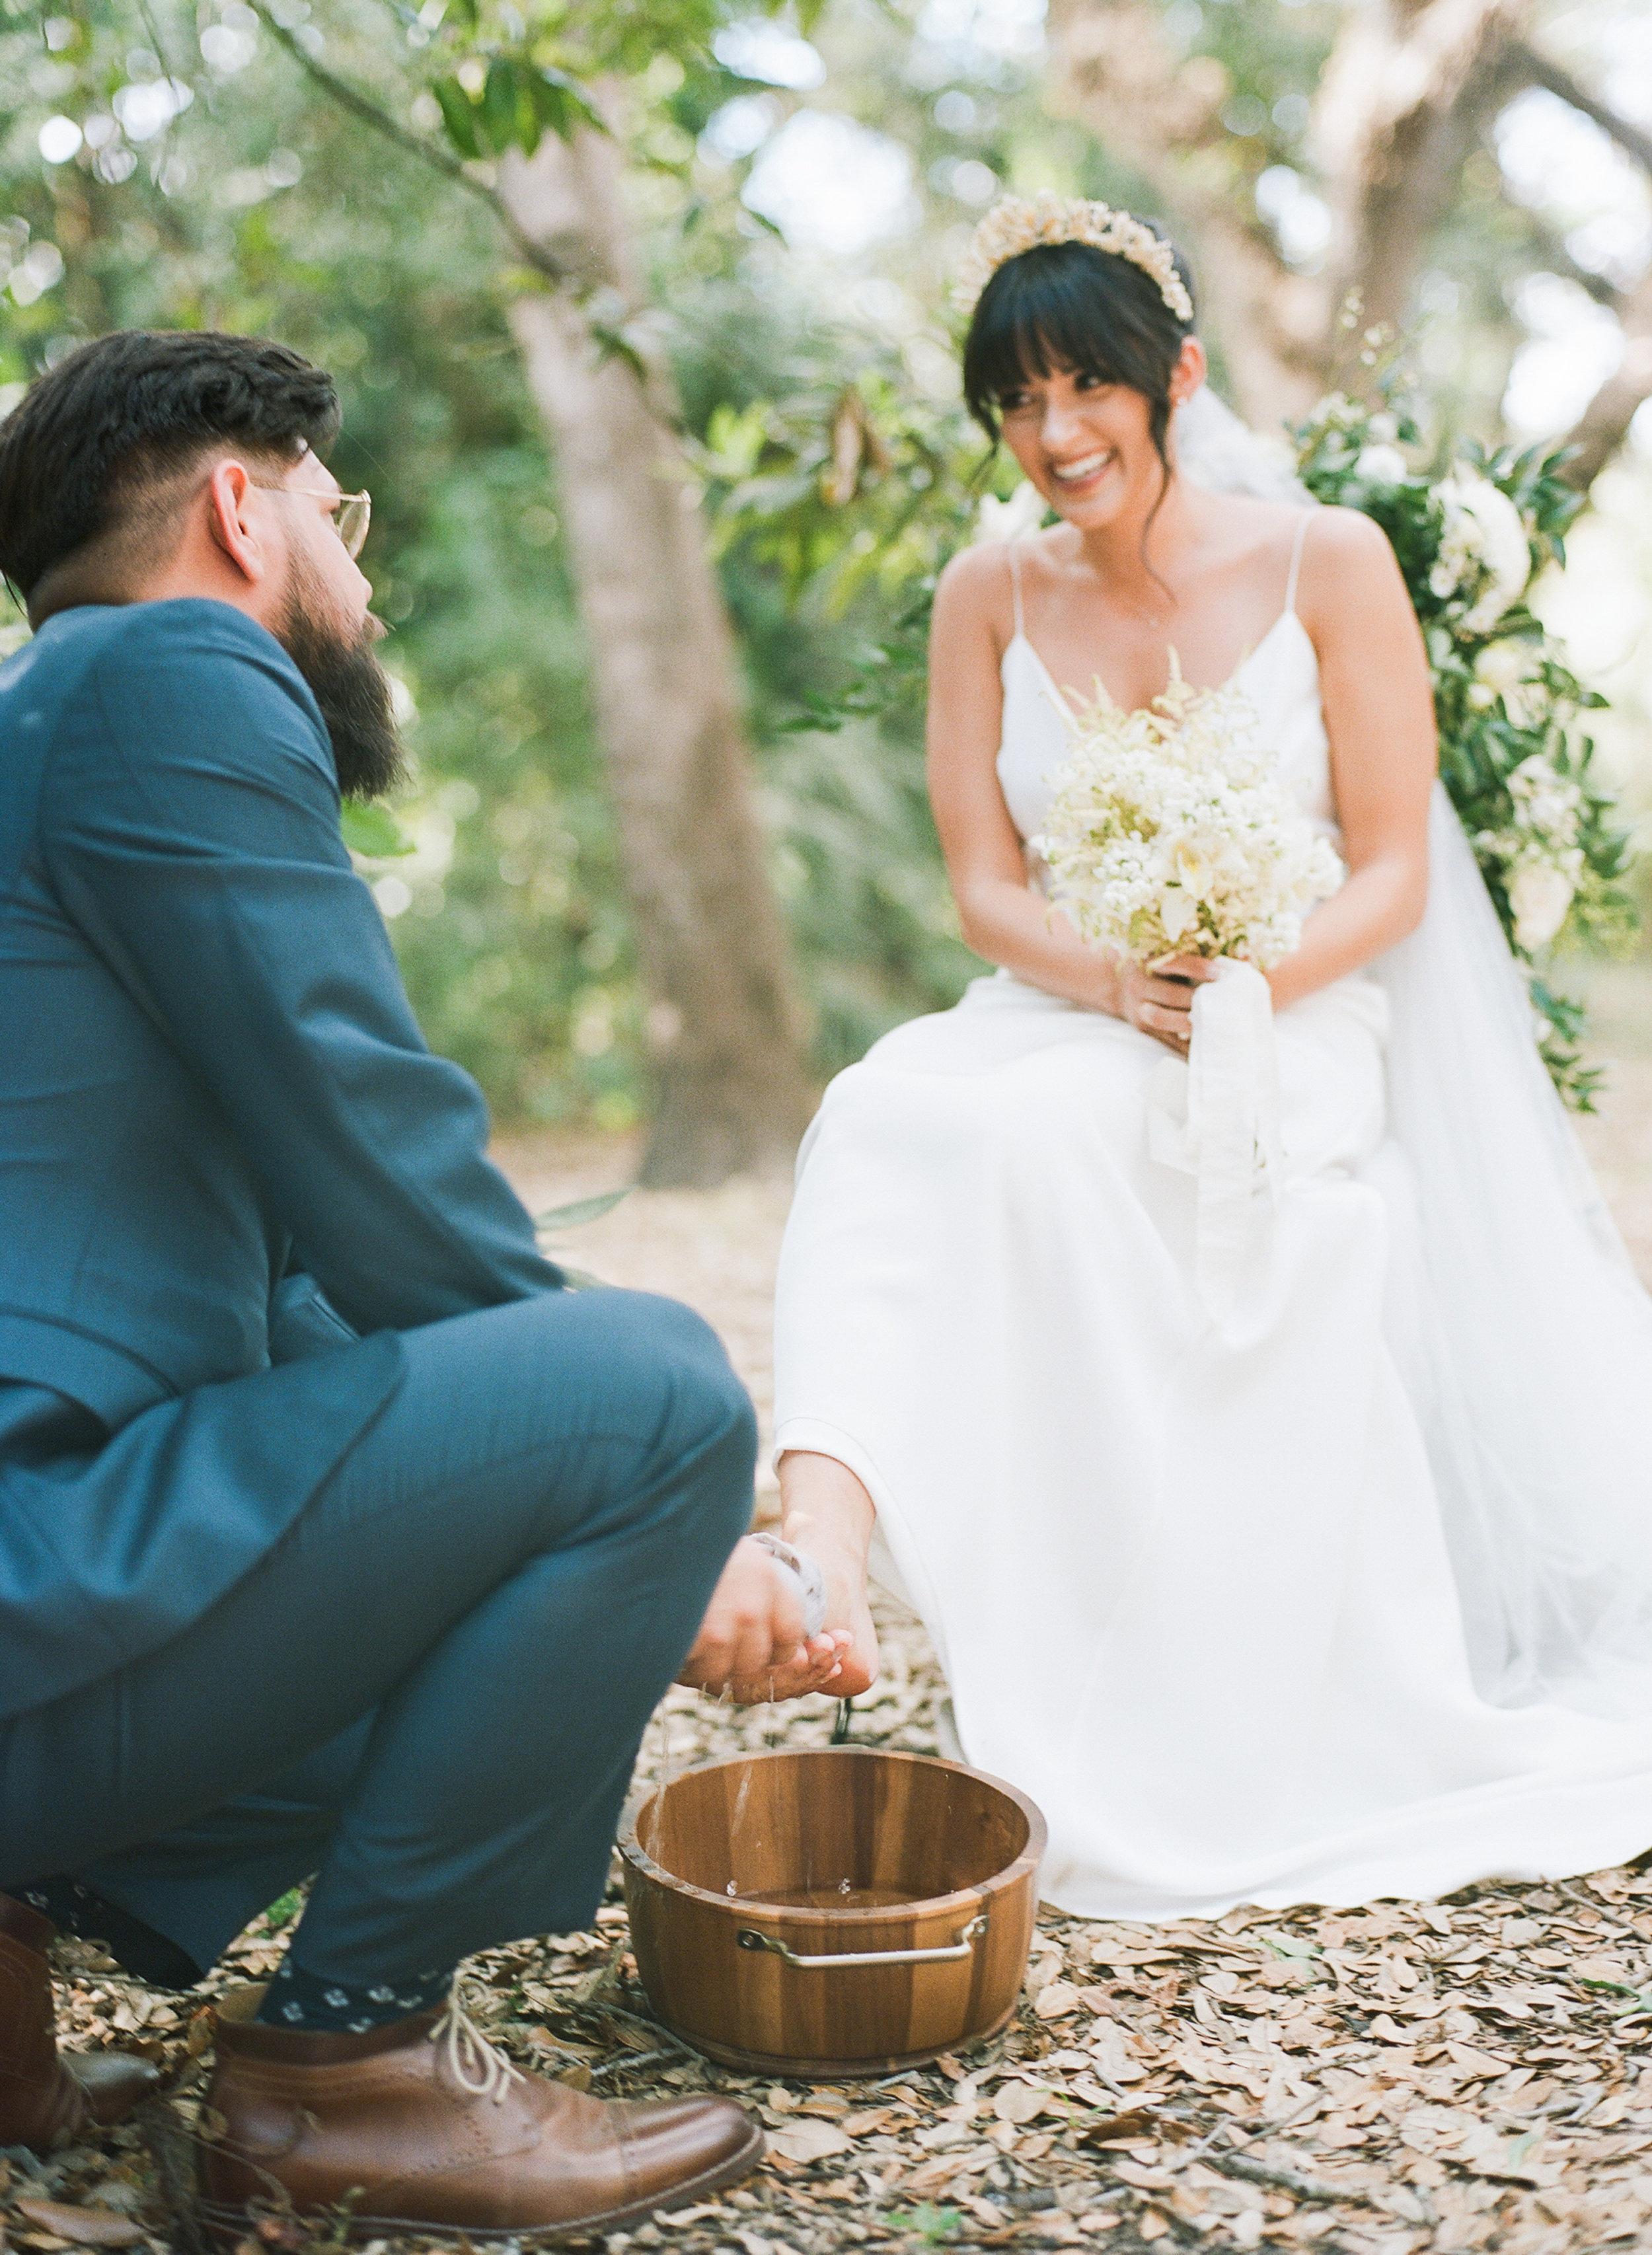 33-foot-washing-wedding-ceremony.jpg